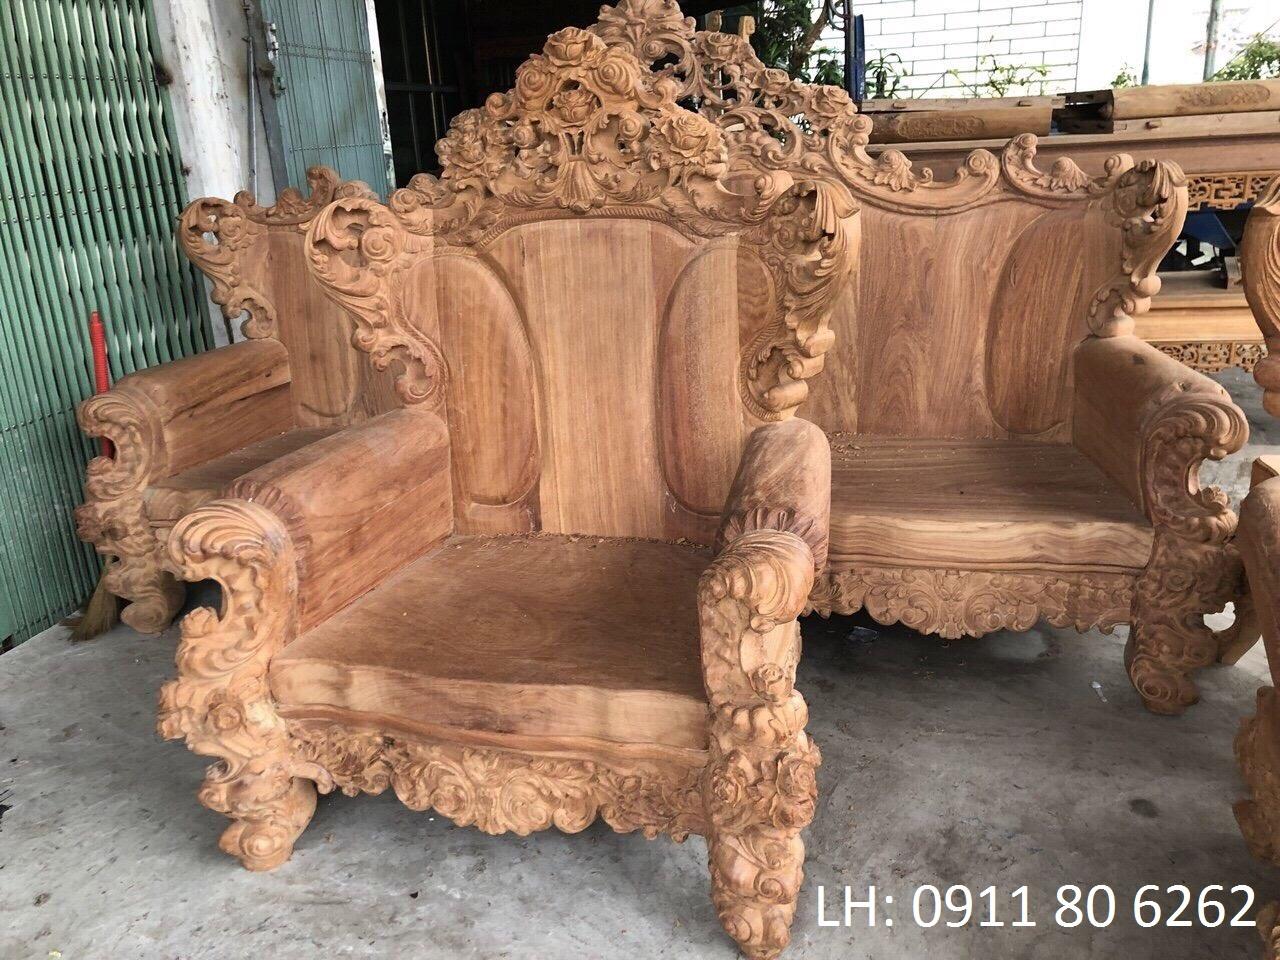 z1425769458543 c61b48d6548a60bdac5e70287a683c9e - Bộ Ghế Hoàng Gia Louis MS: 51